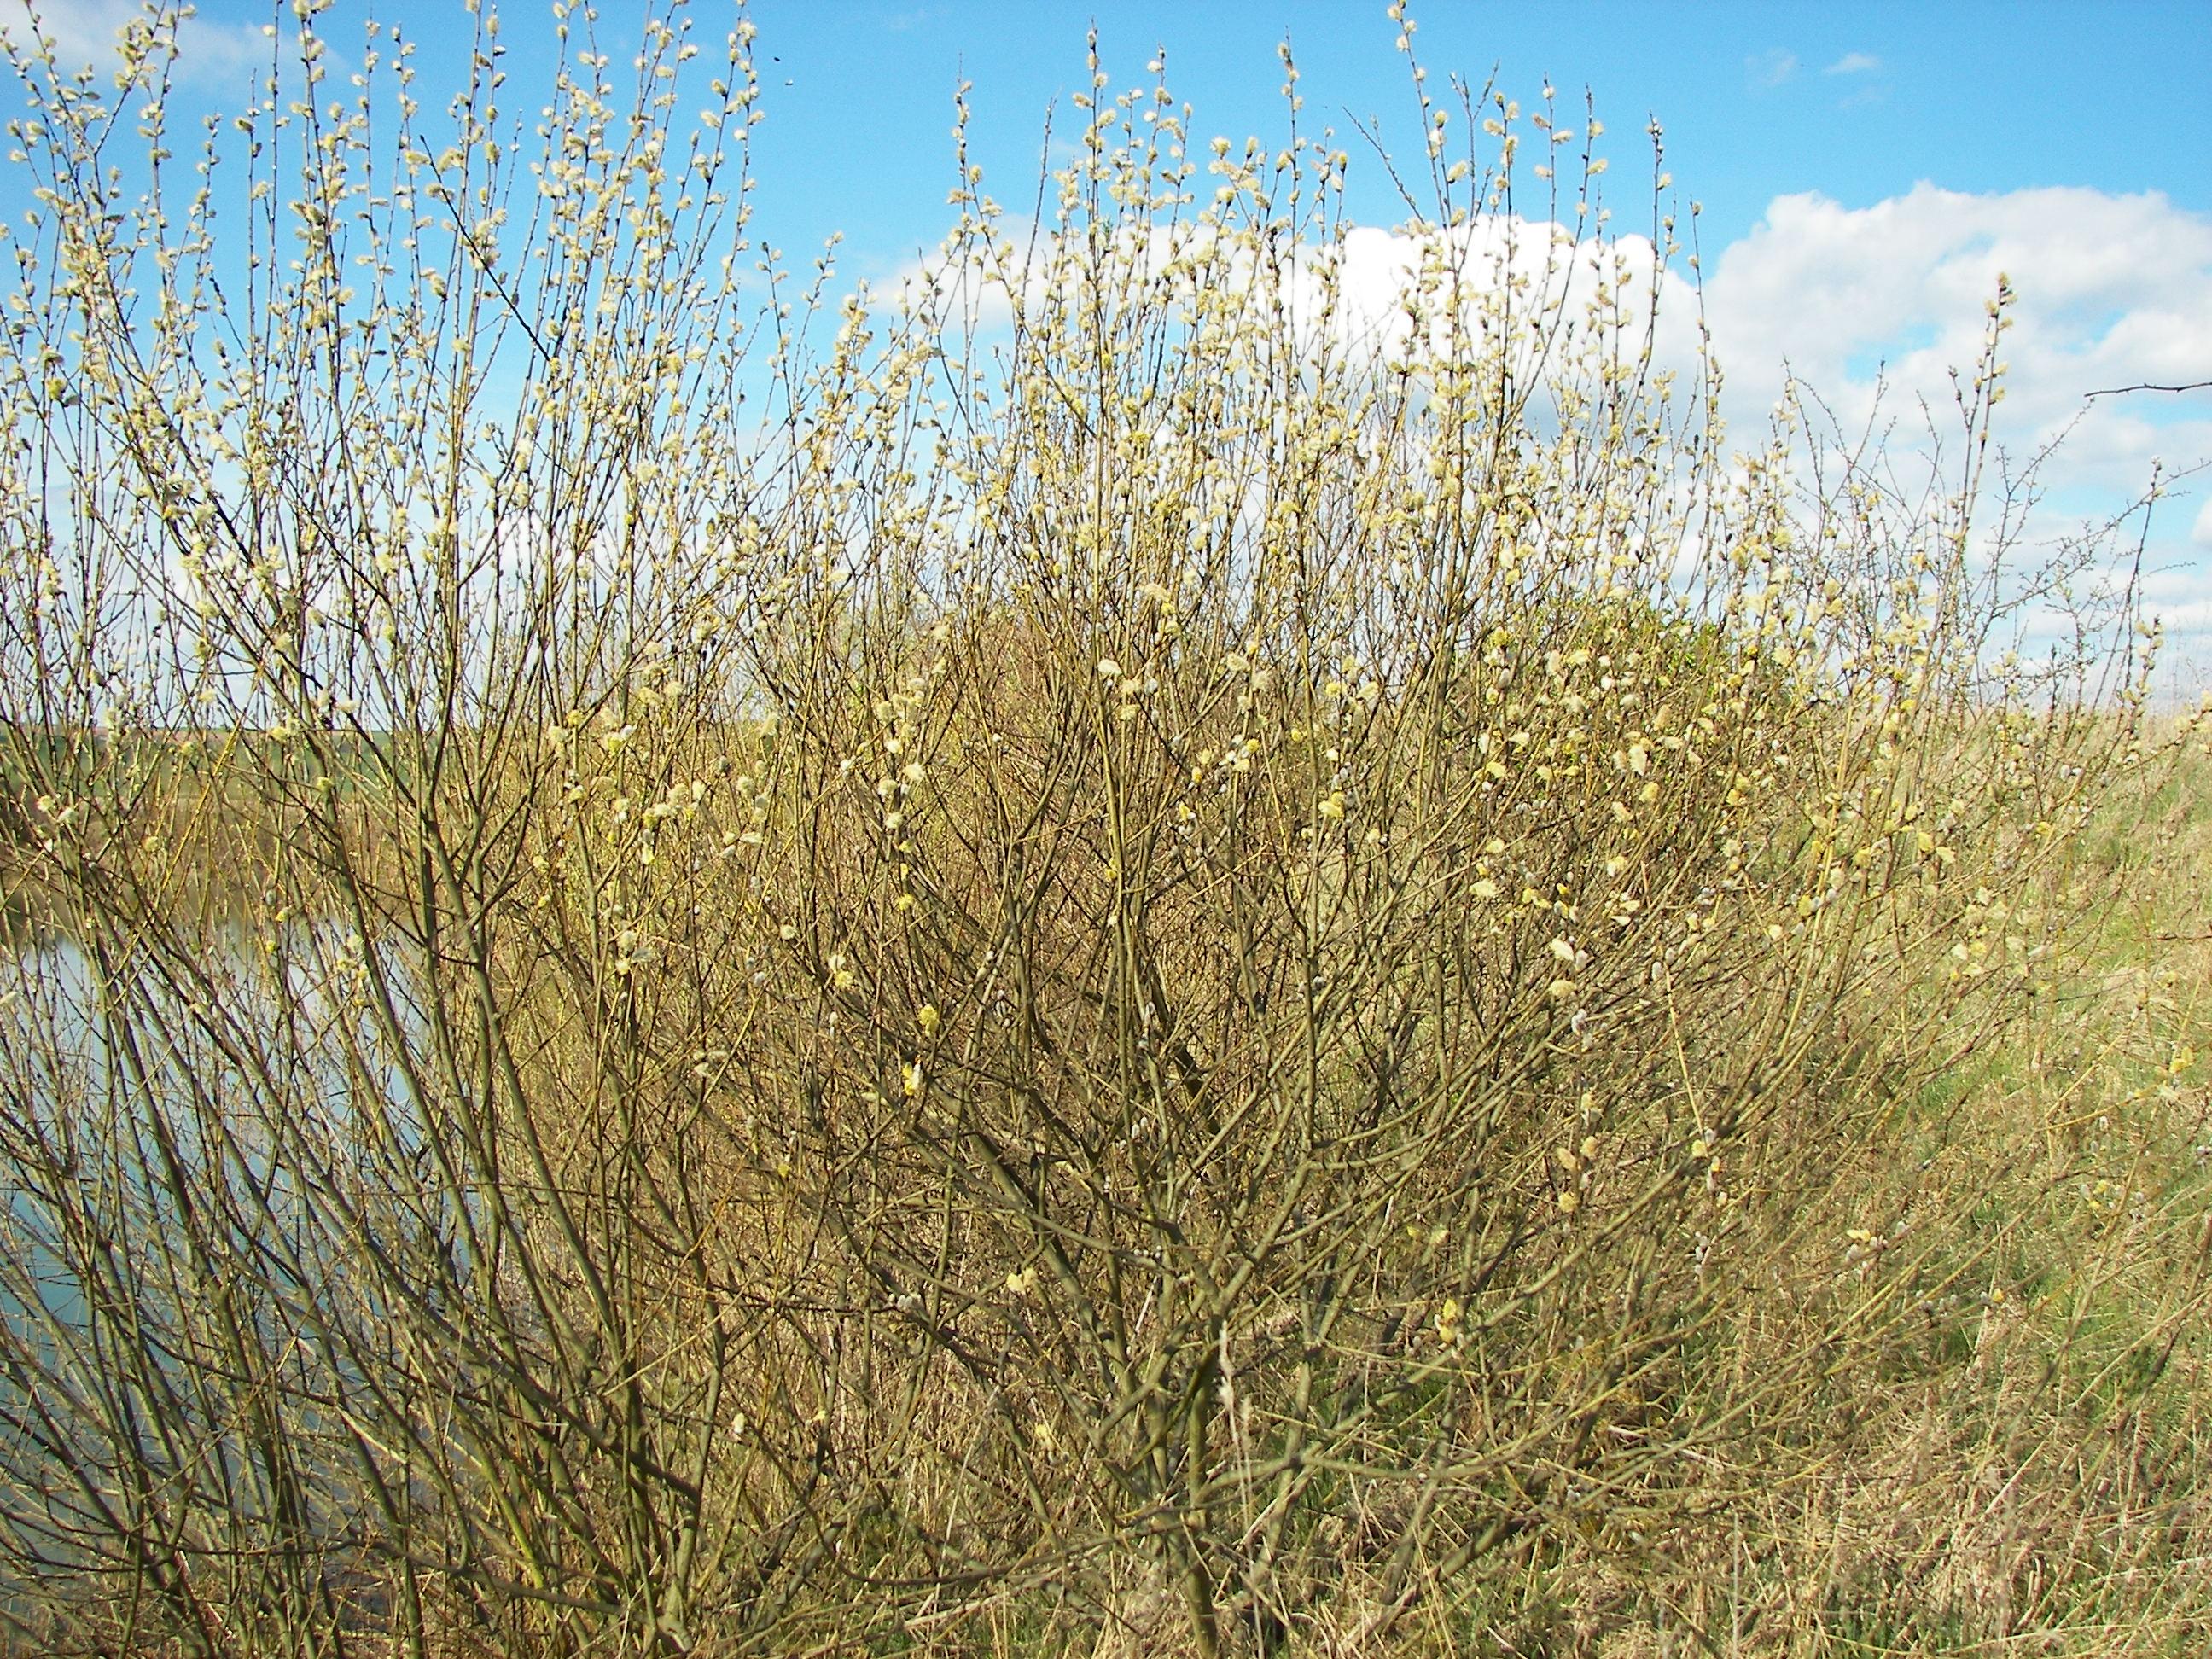 File:Salix caprea 019.jpg - Wikimedia Commons